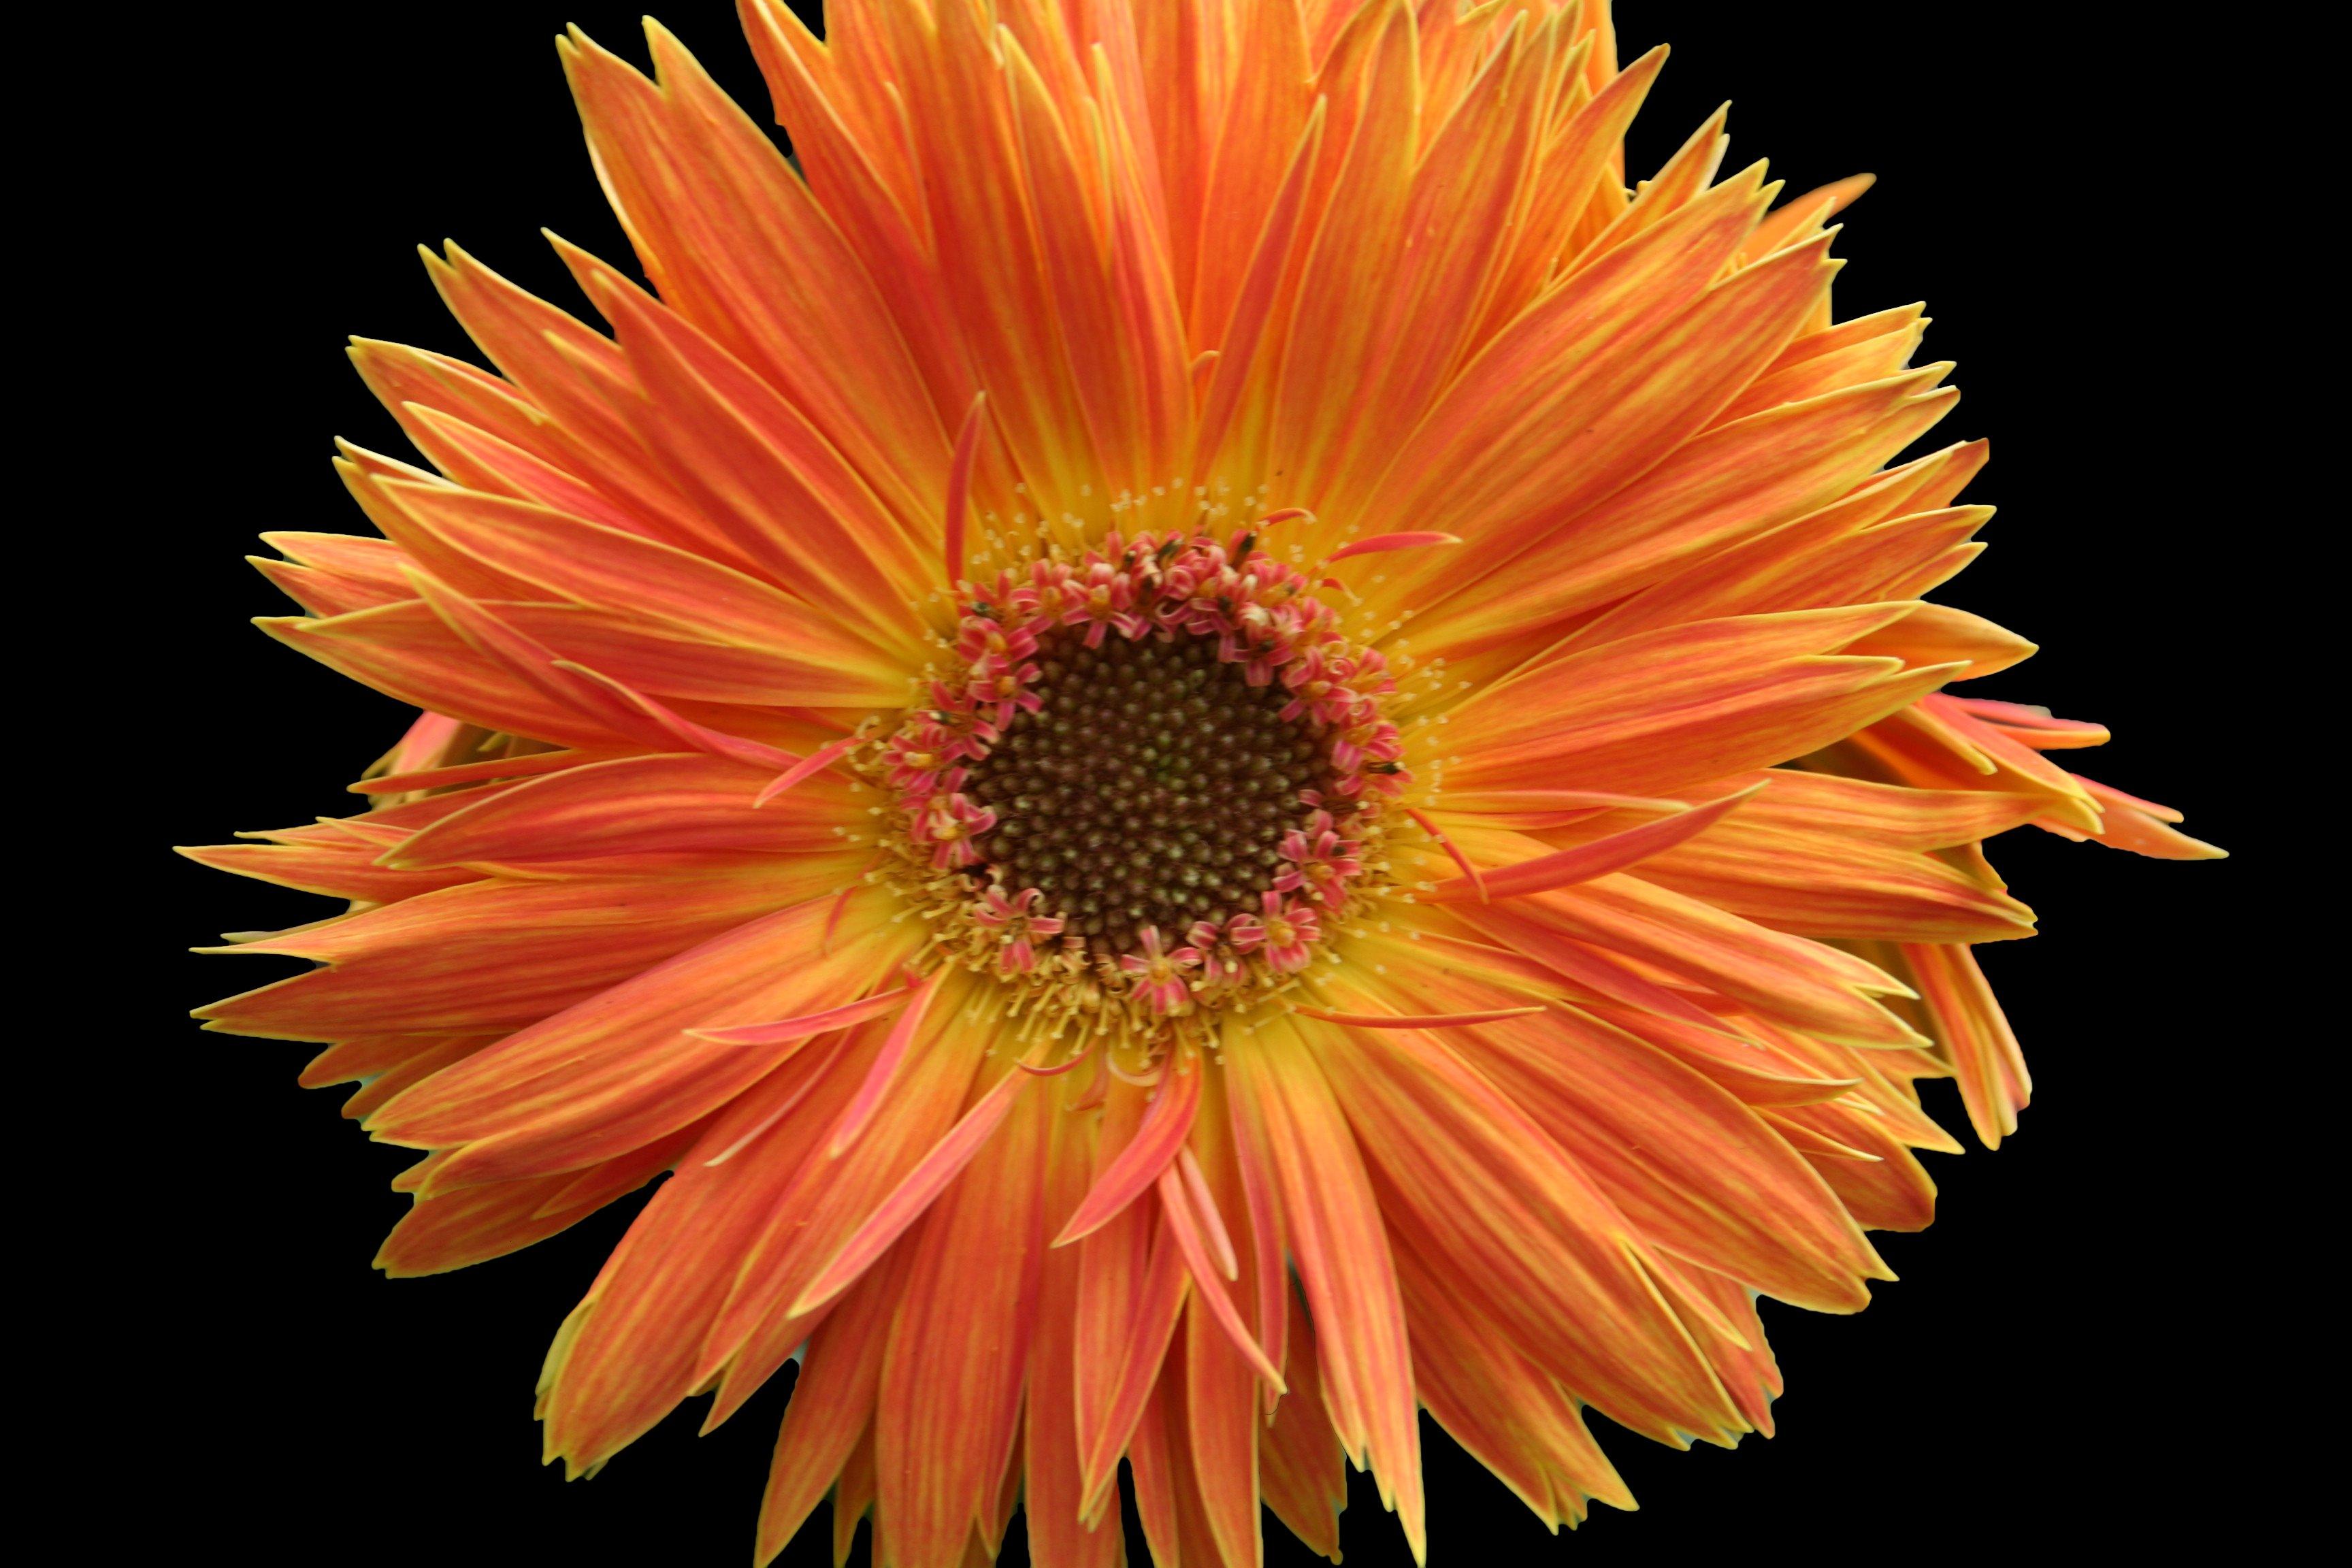 Filebeautiful orange daisy flower west virginia forestwander filebeautiful orange daisy flower west virginia forestwanderg izmirmasajfo